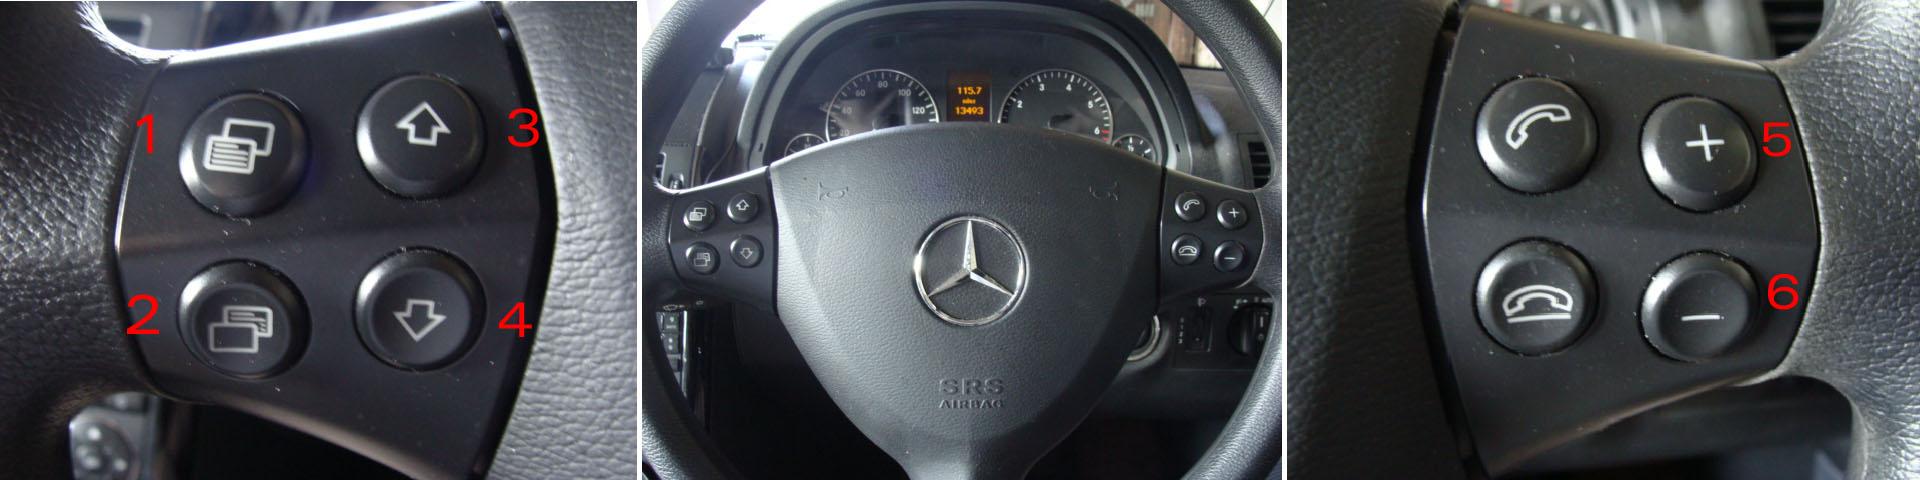 bert rowe lofty s homepage a class info w169 instrument cluster rh aclassinfo co uk Mercedes-Benz A-Class mercedes w169 workshop manual pdf